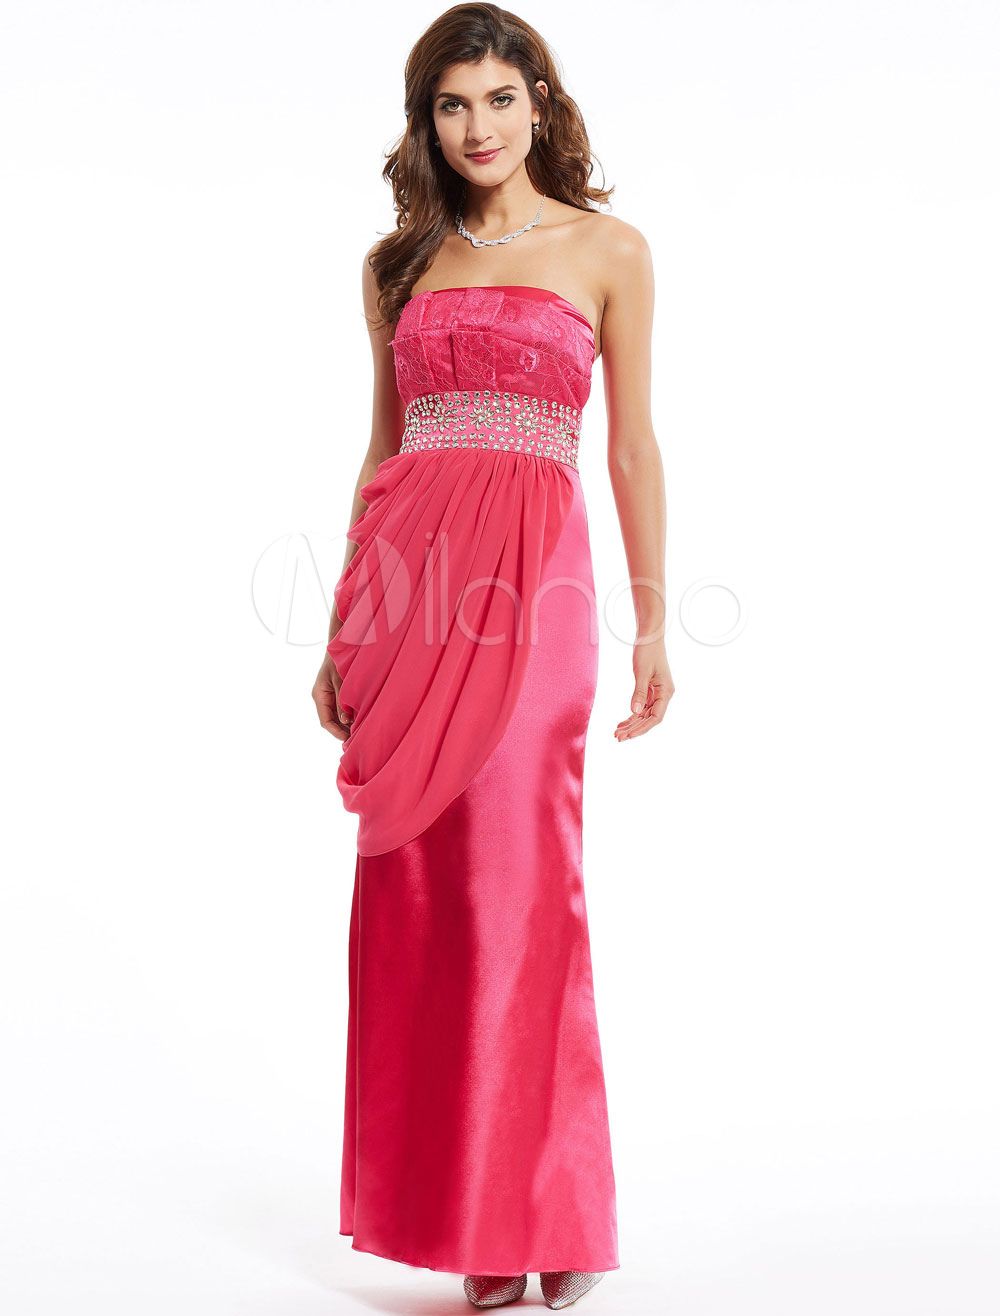 Buy Rose Evening Dresses Strapless Satin Prom Dresses Side Draped Beading Long Formal Dress for $83.59 in Milanoo store